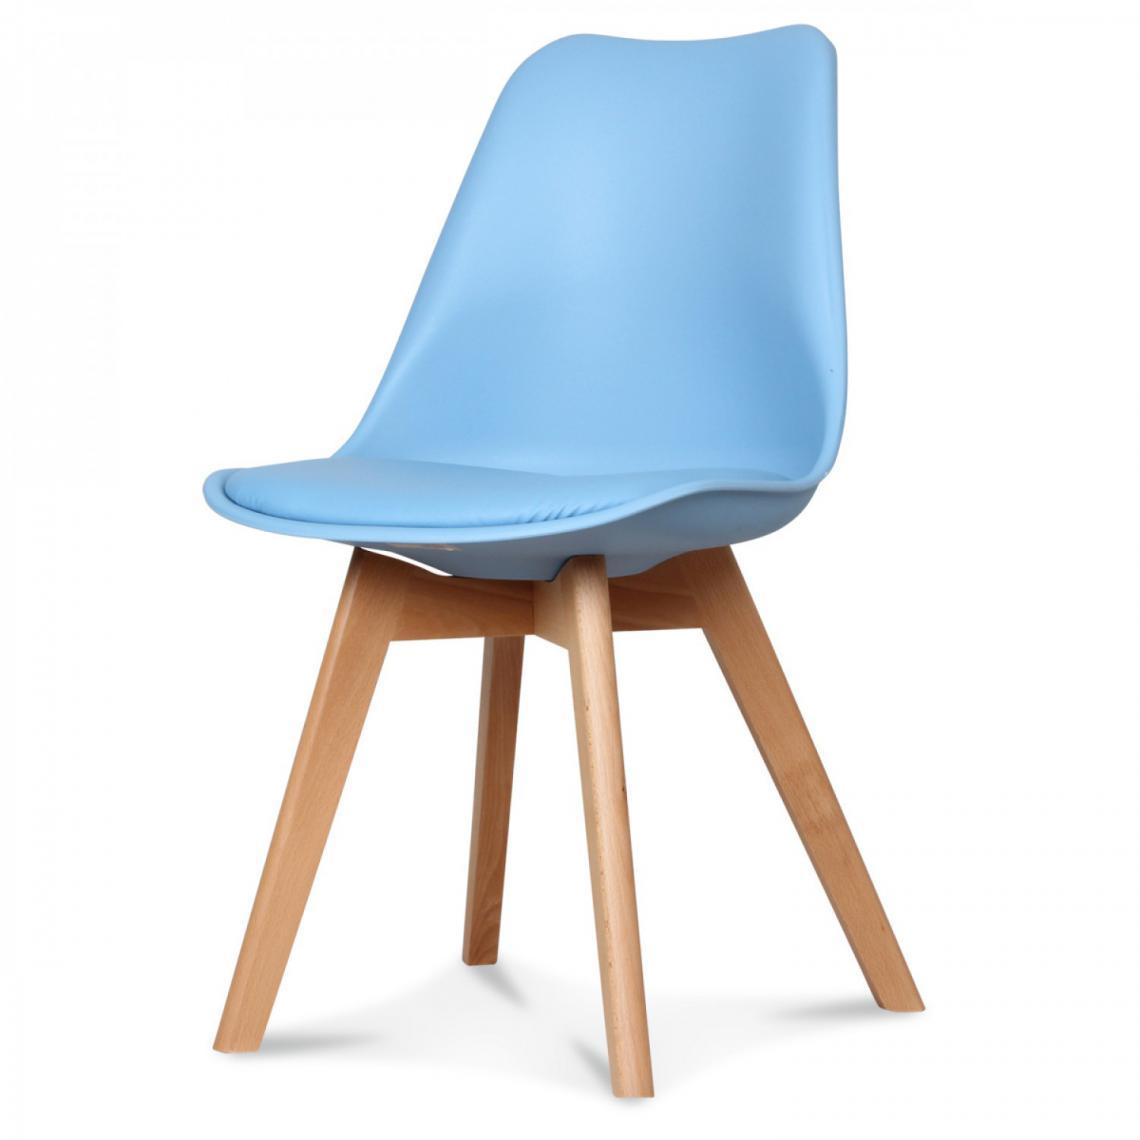 chaise design style scandinave bleu clair esben 3 suisses. Black Bedroom Furniture Sets. Home Design Ideas